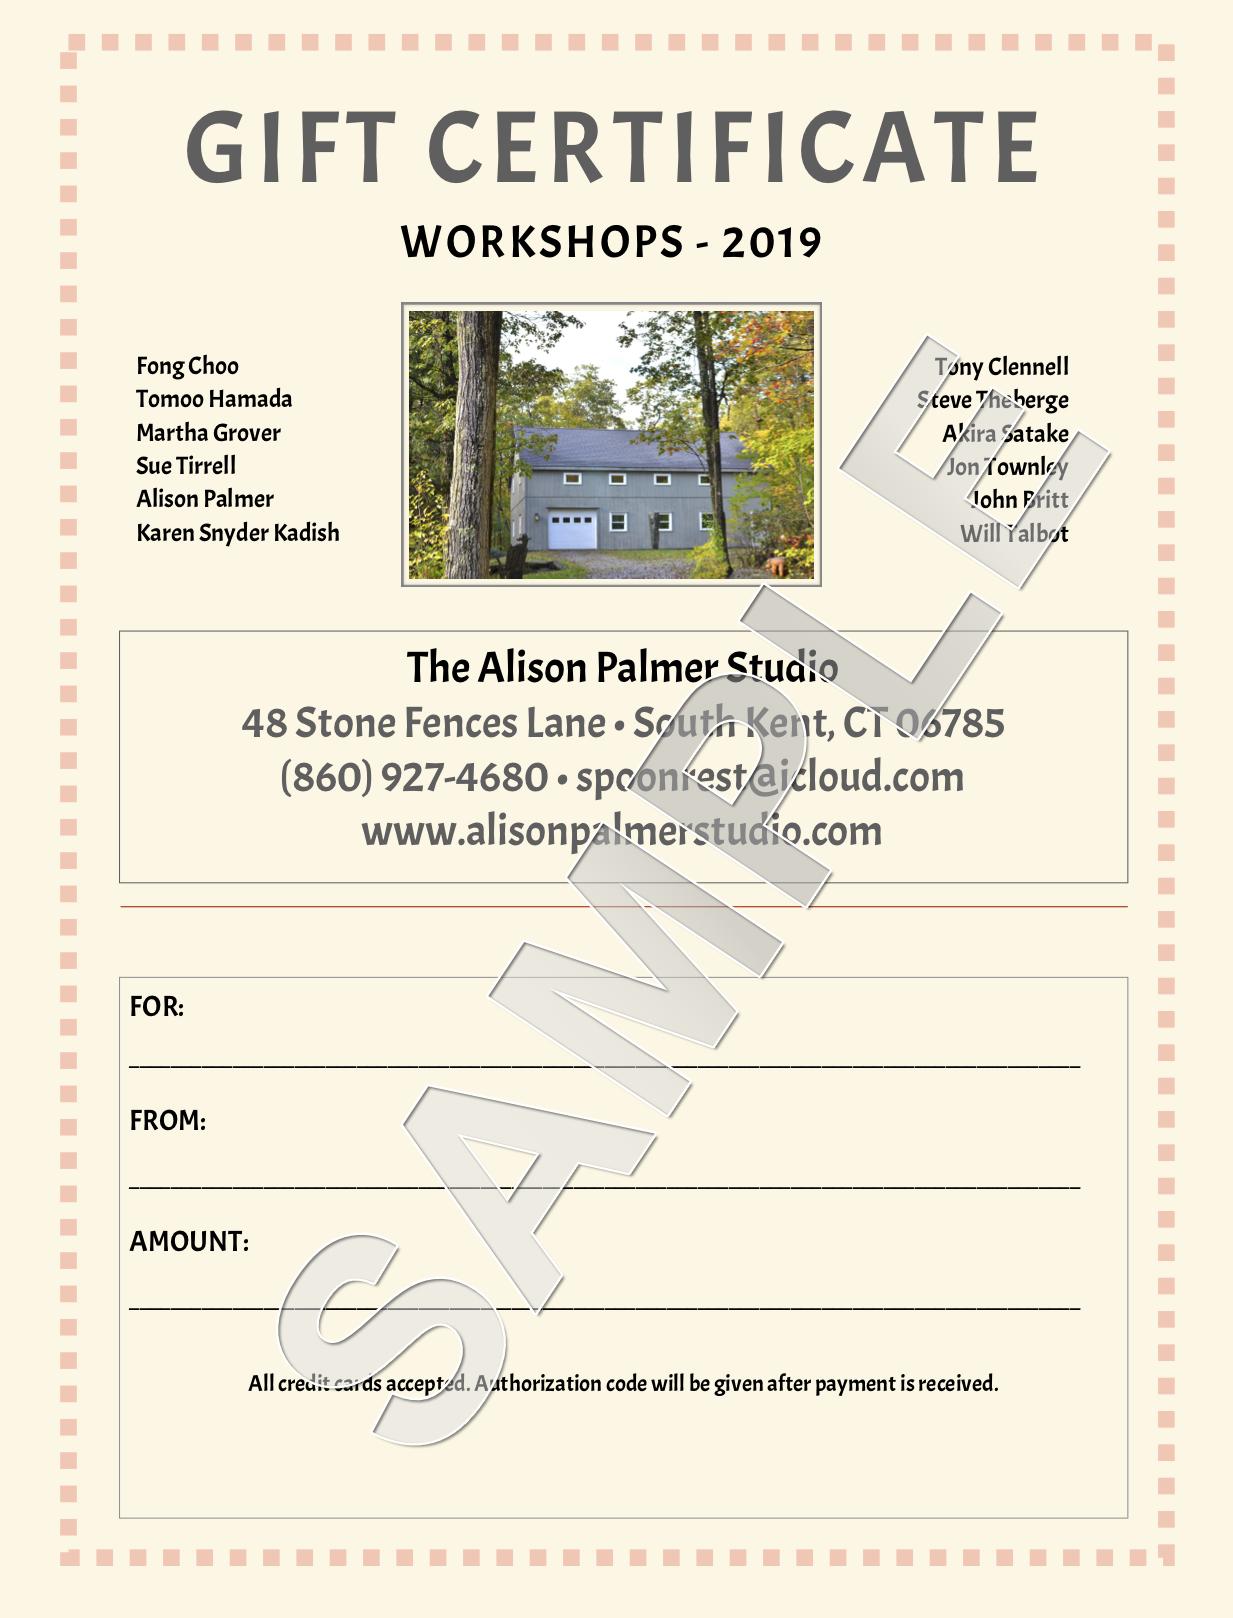 Gift Certificate Workshop Copy The Alison Palmer Studio